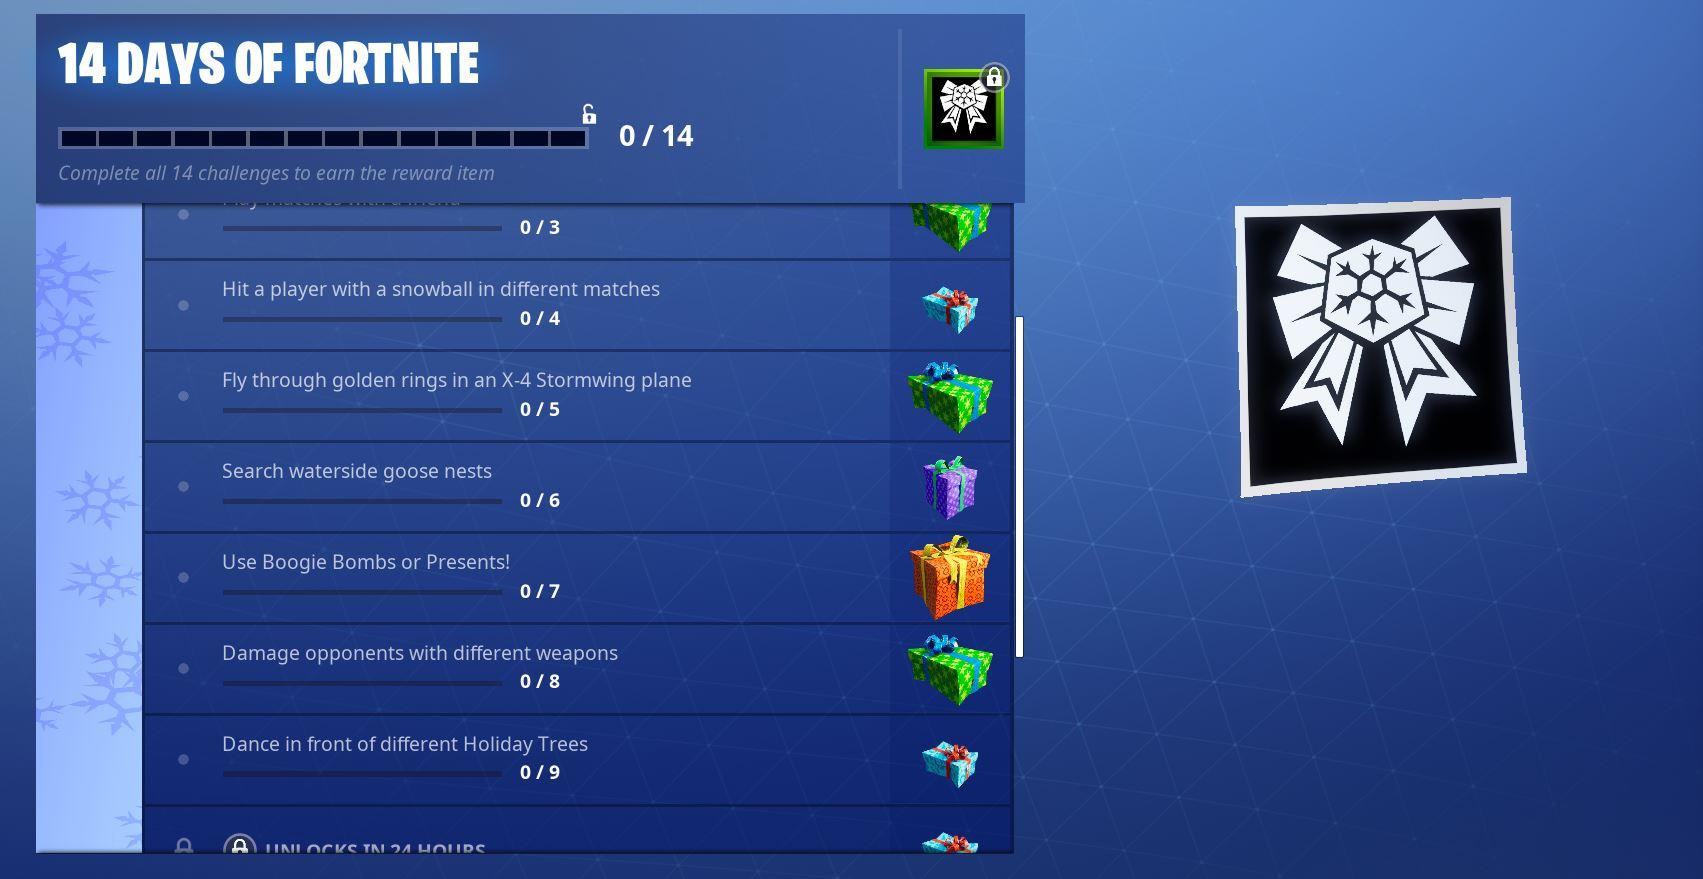 14 days of Fortnite Challenge Day 9